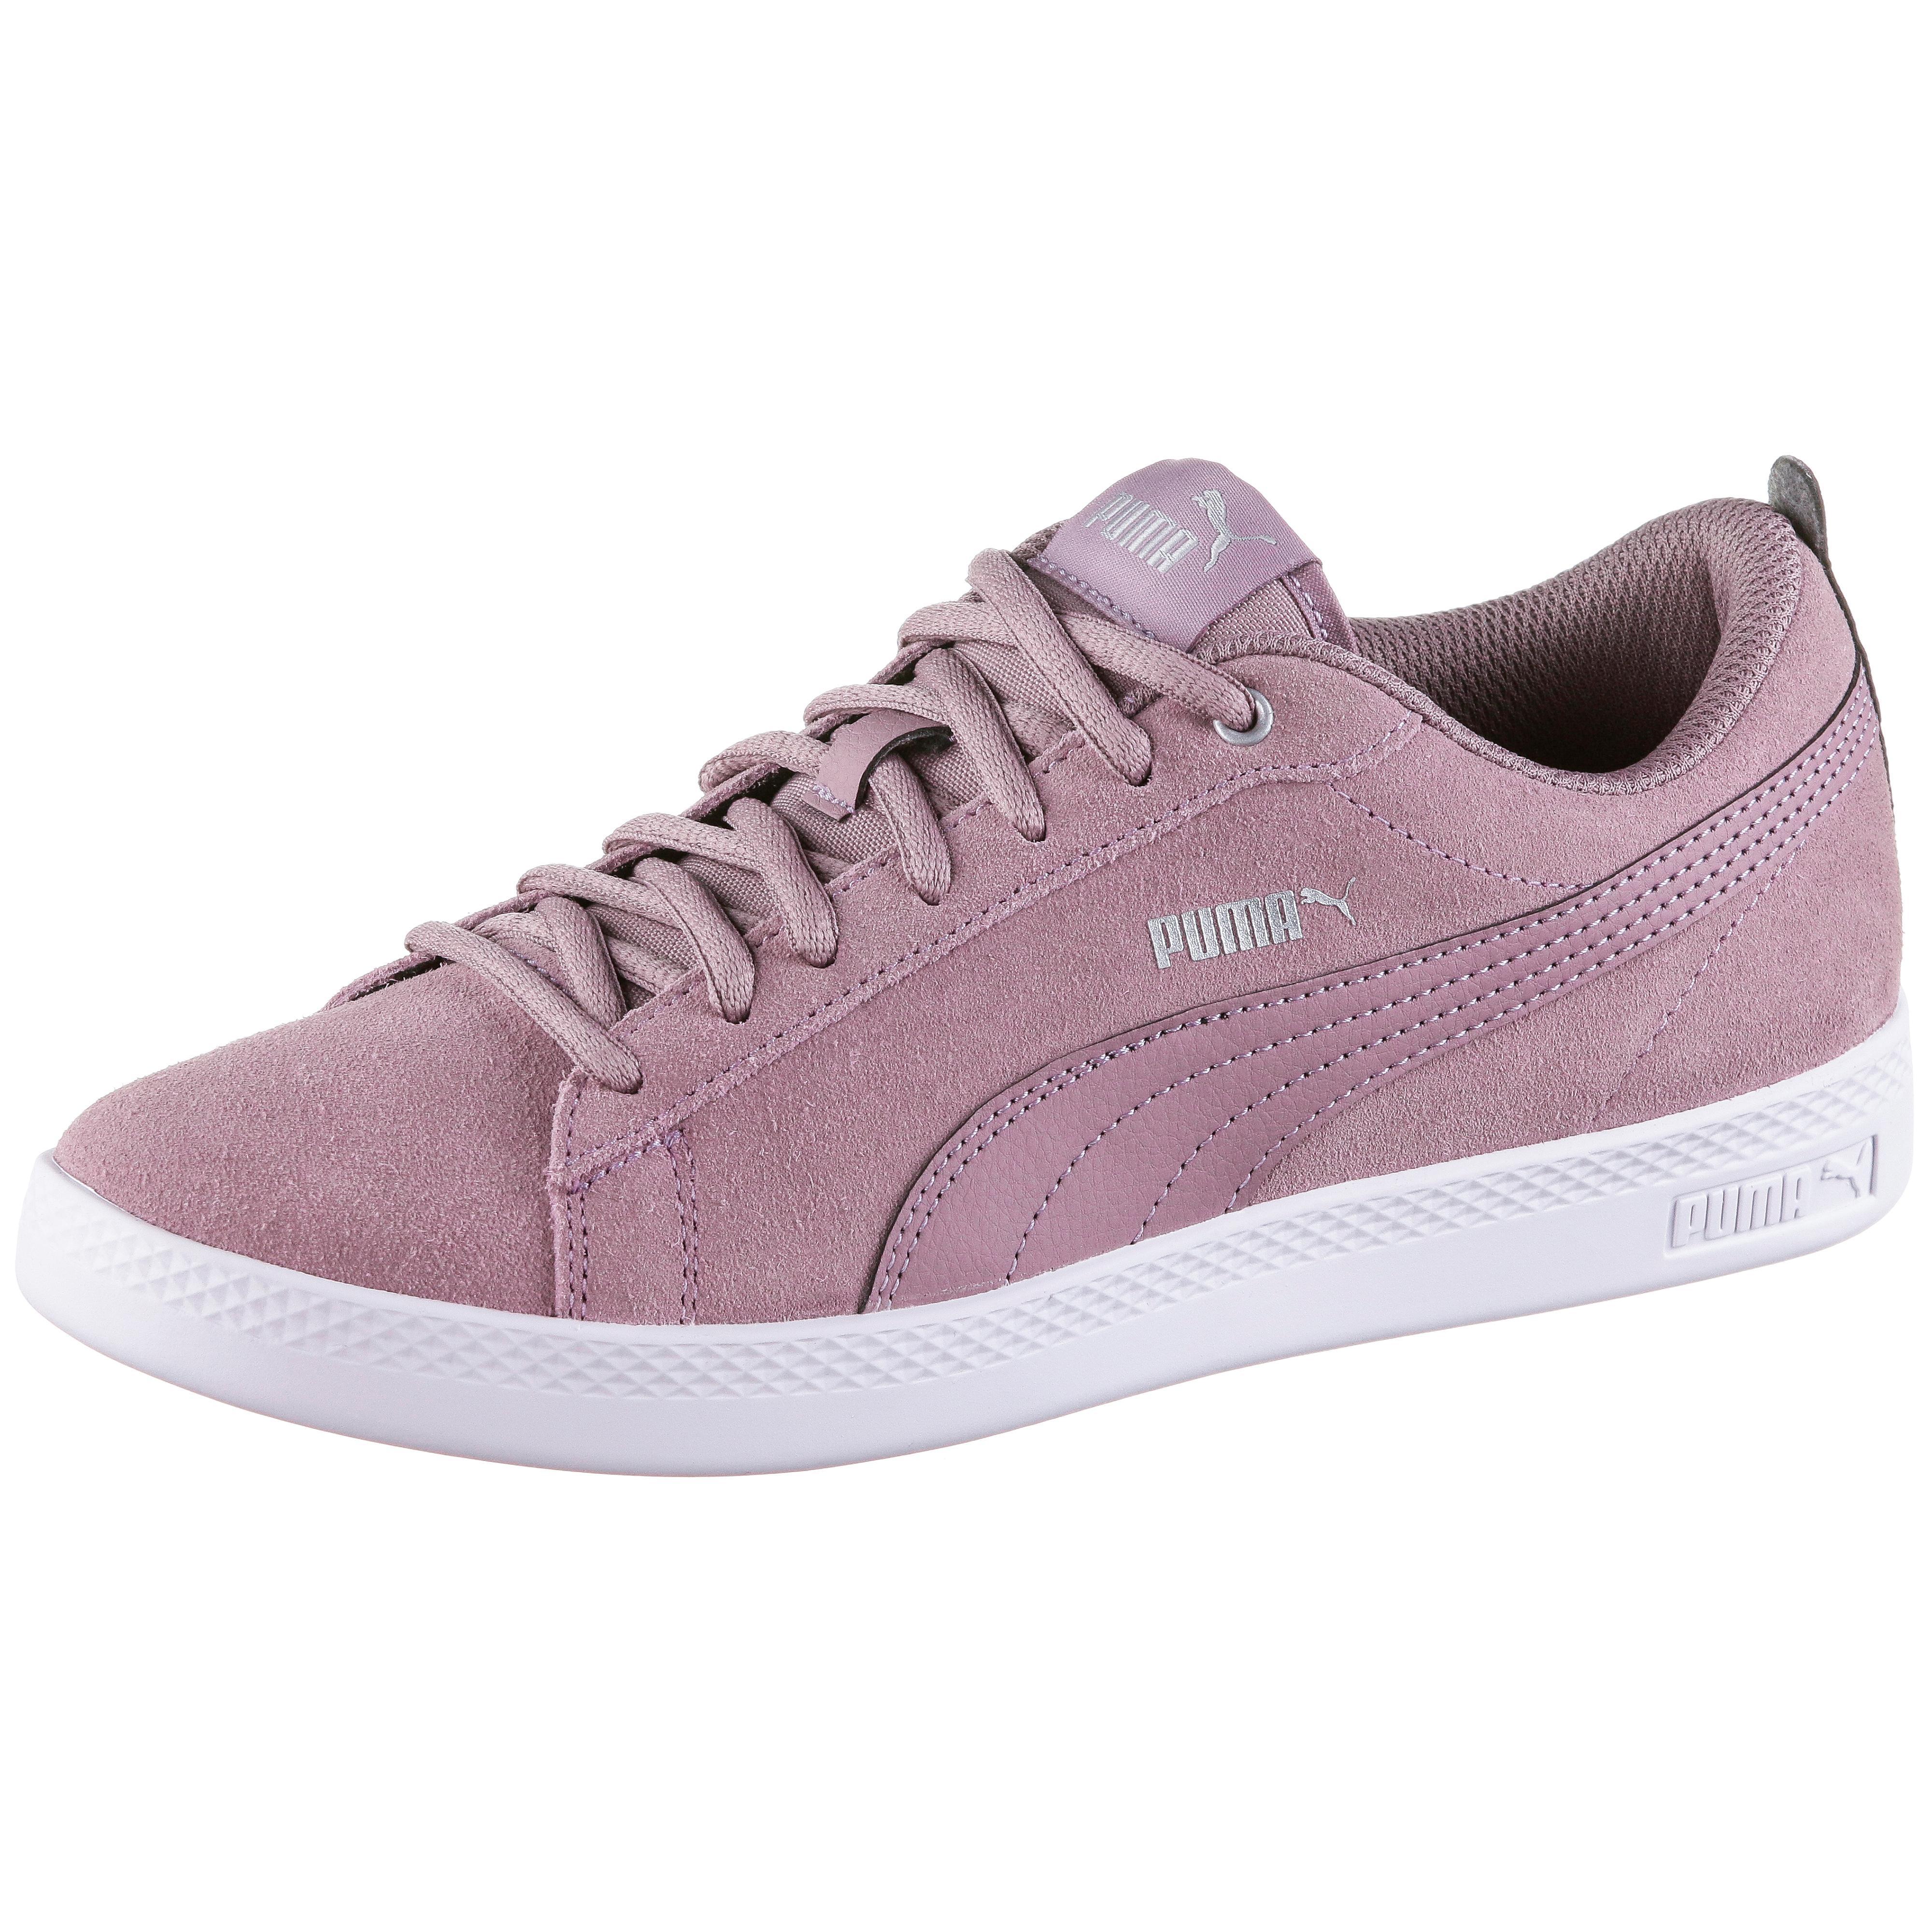 PUMA Smash V2 SD Sneaker Damen elderberry silver puma white